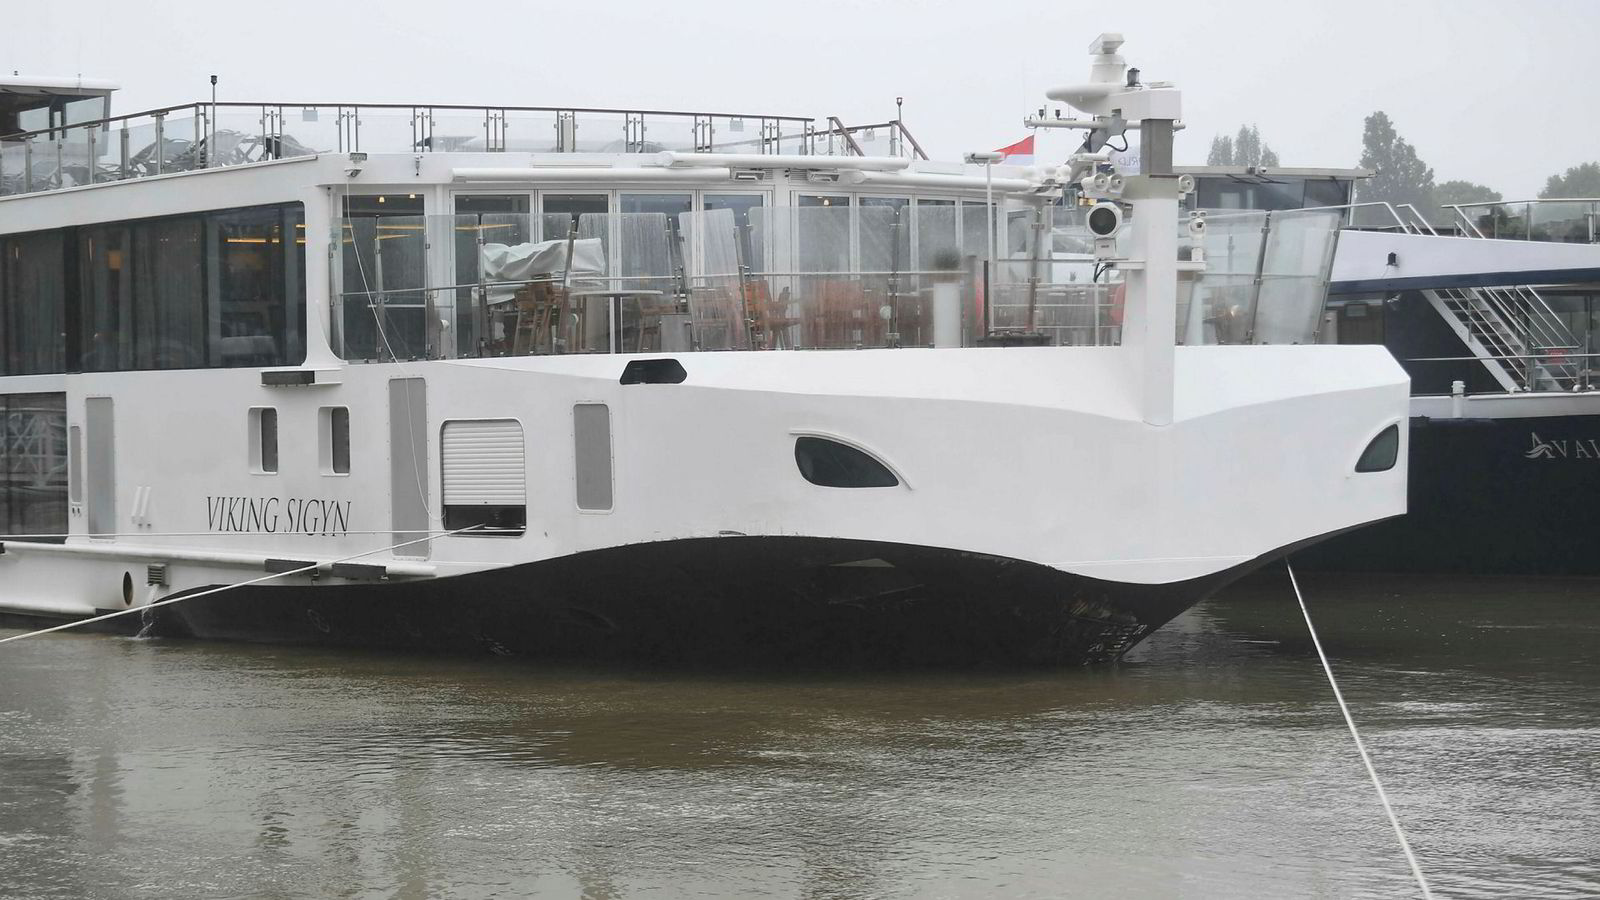 Viking Sigyn ligger her til havn i Budapest etter ulykken på Donau.